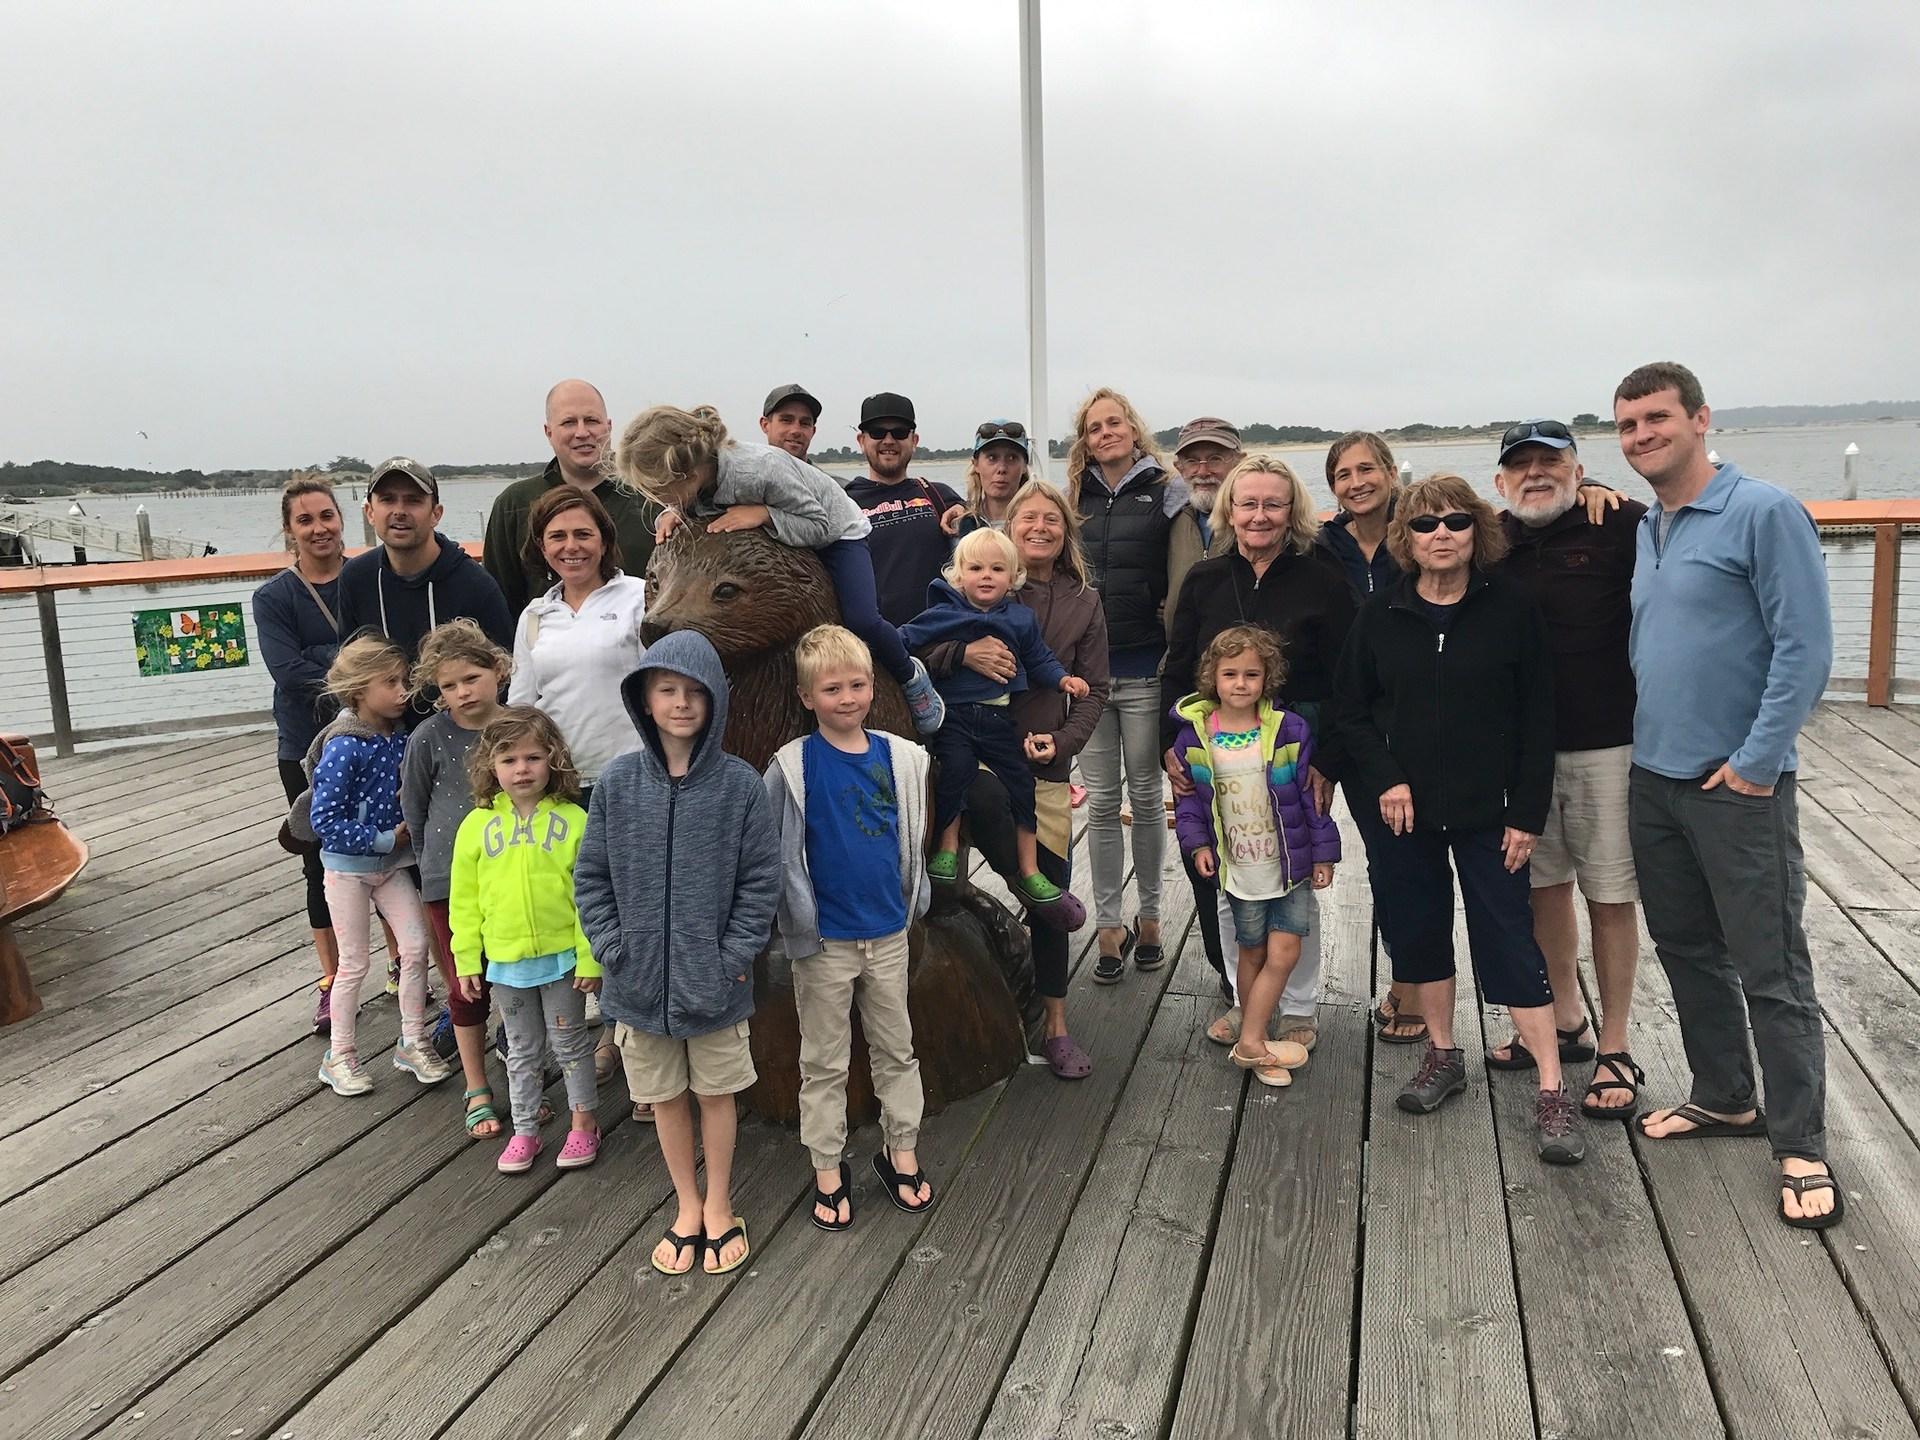 Family reunion in Oregon